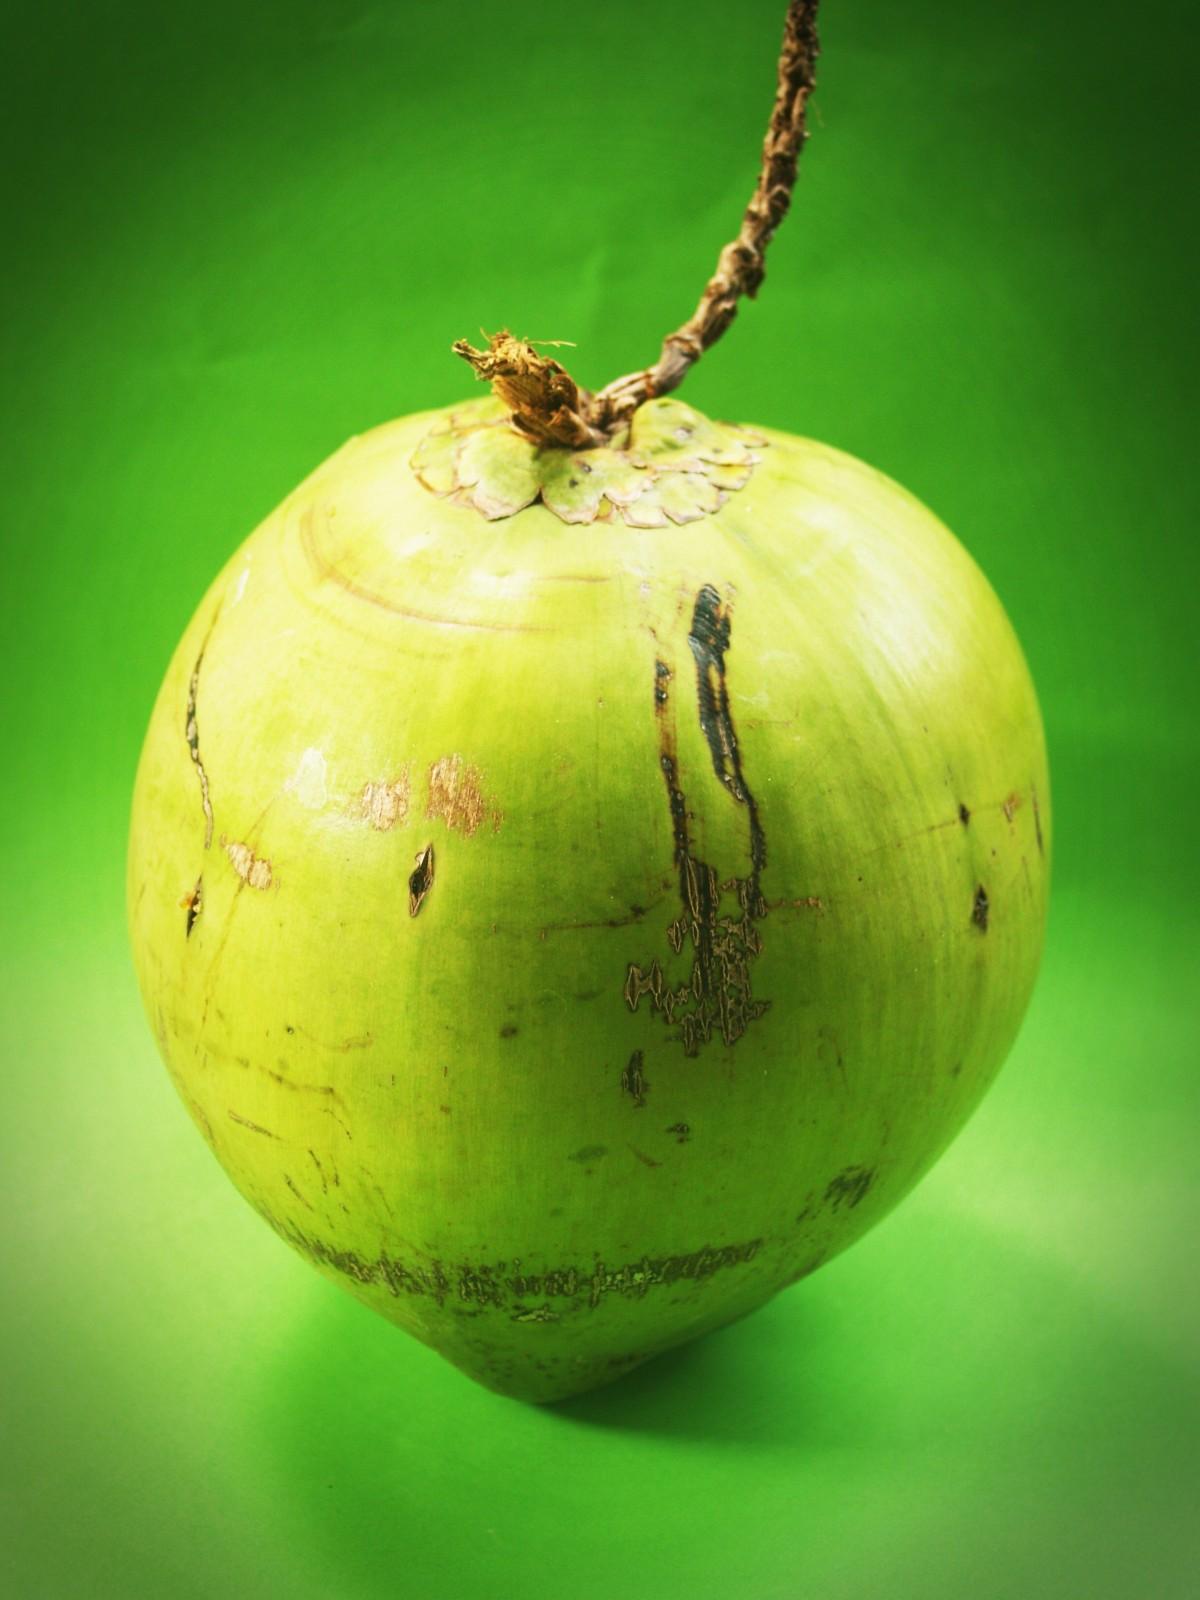 Coconut - Foto: © Benjamin Madeira / RUL2C/Instagram